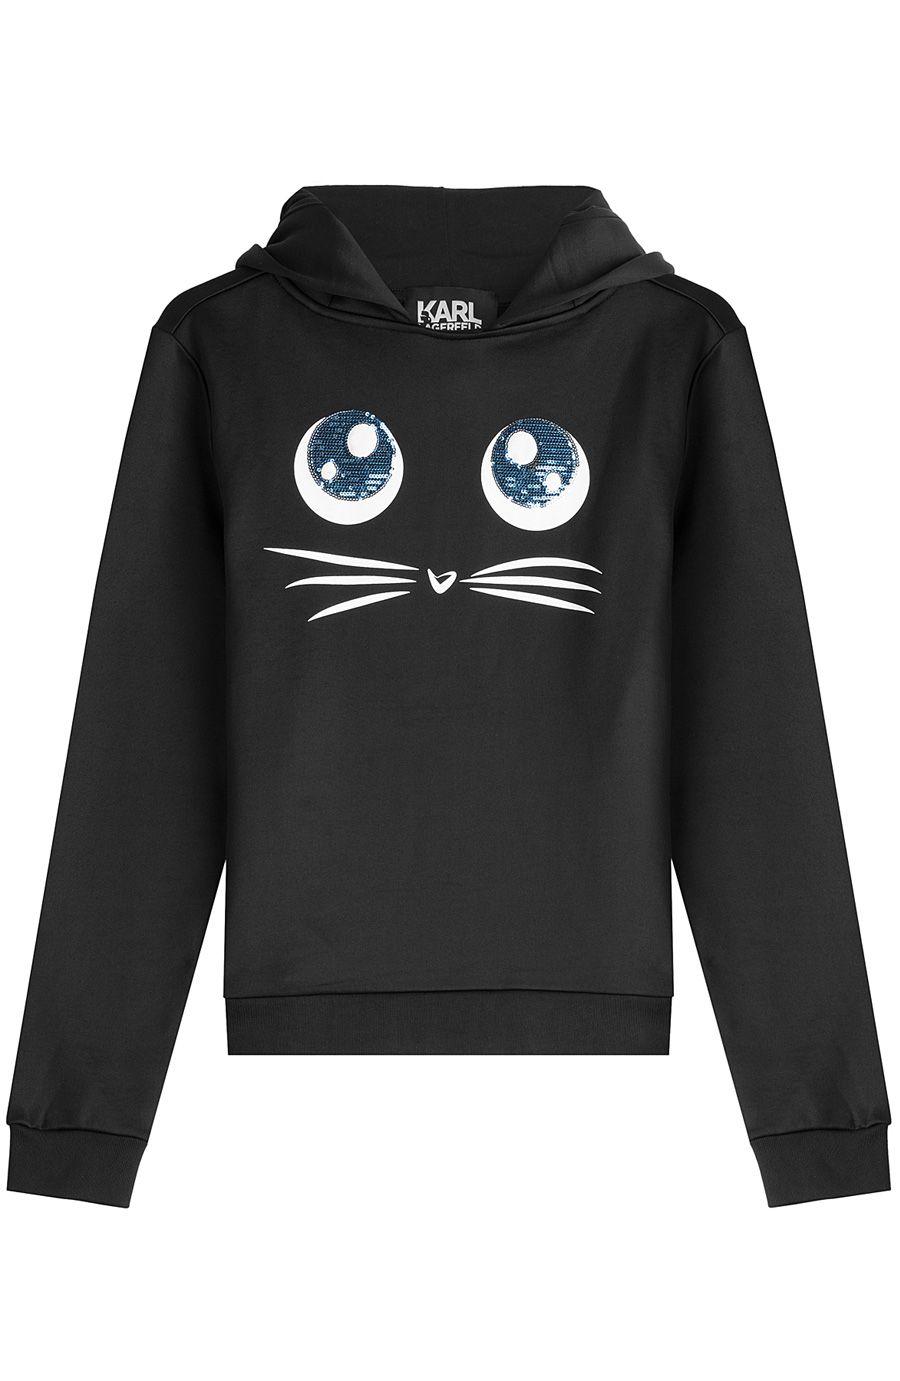 ecfd82a5861 KARL LAGERFELD Choupette Big Eyes Printed Hoody. #karllagerfeld #cloth # sweatshirts